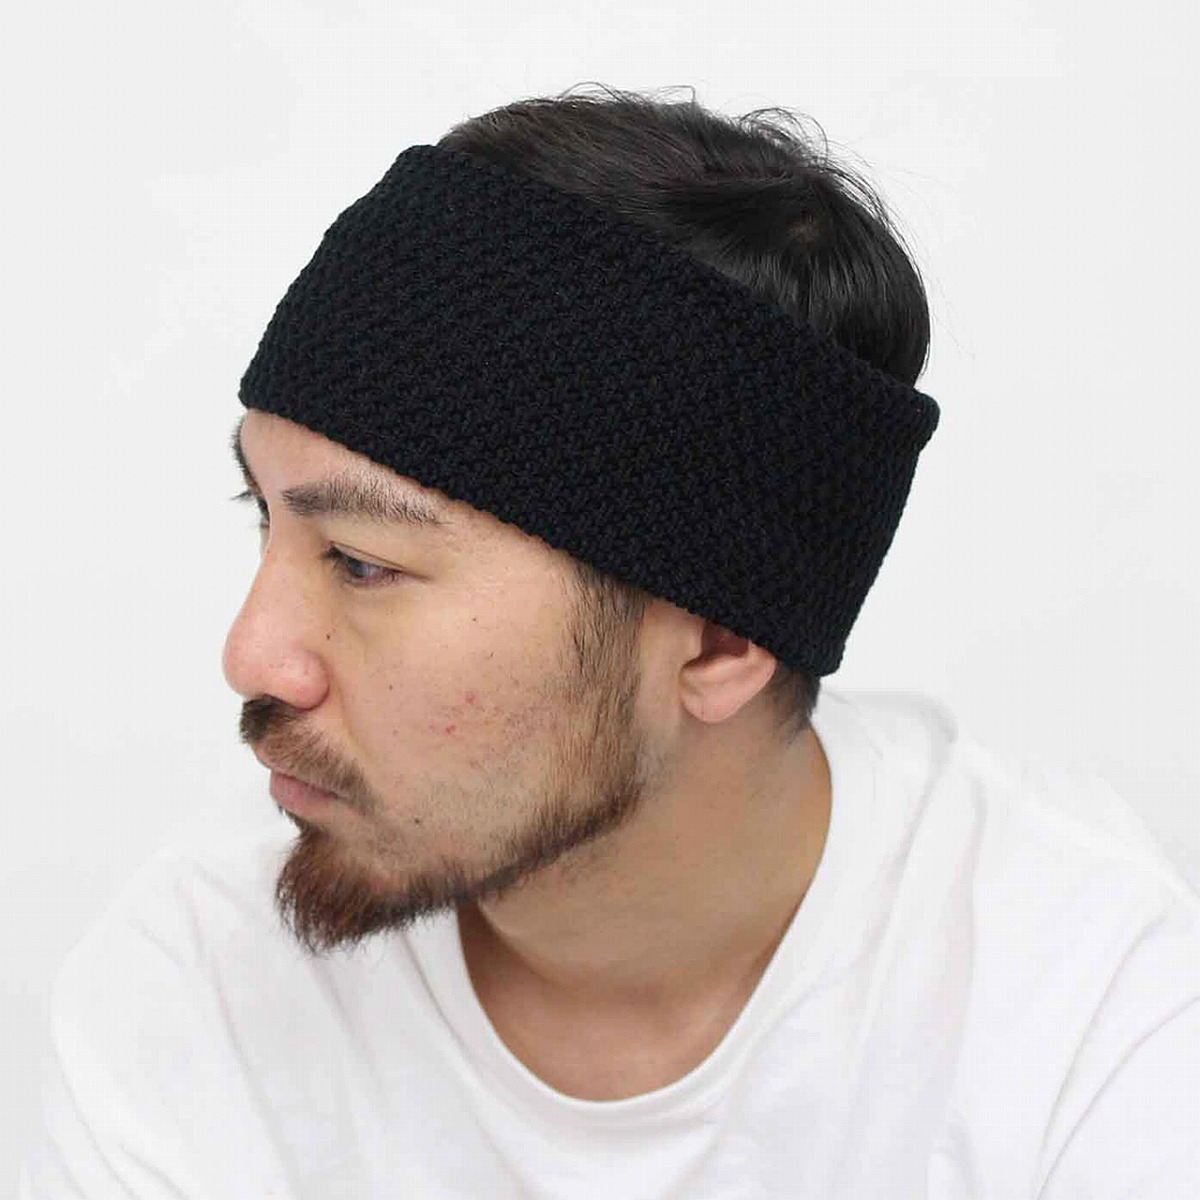 elehelm hat store rakuten global market lady s knit headband knit